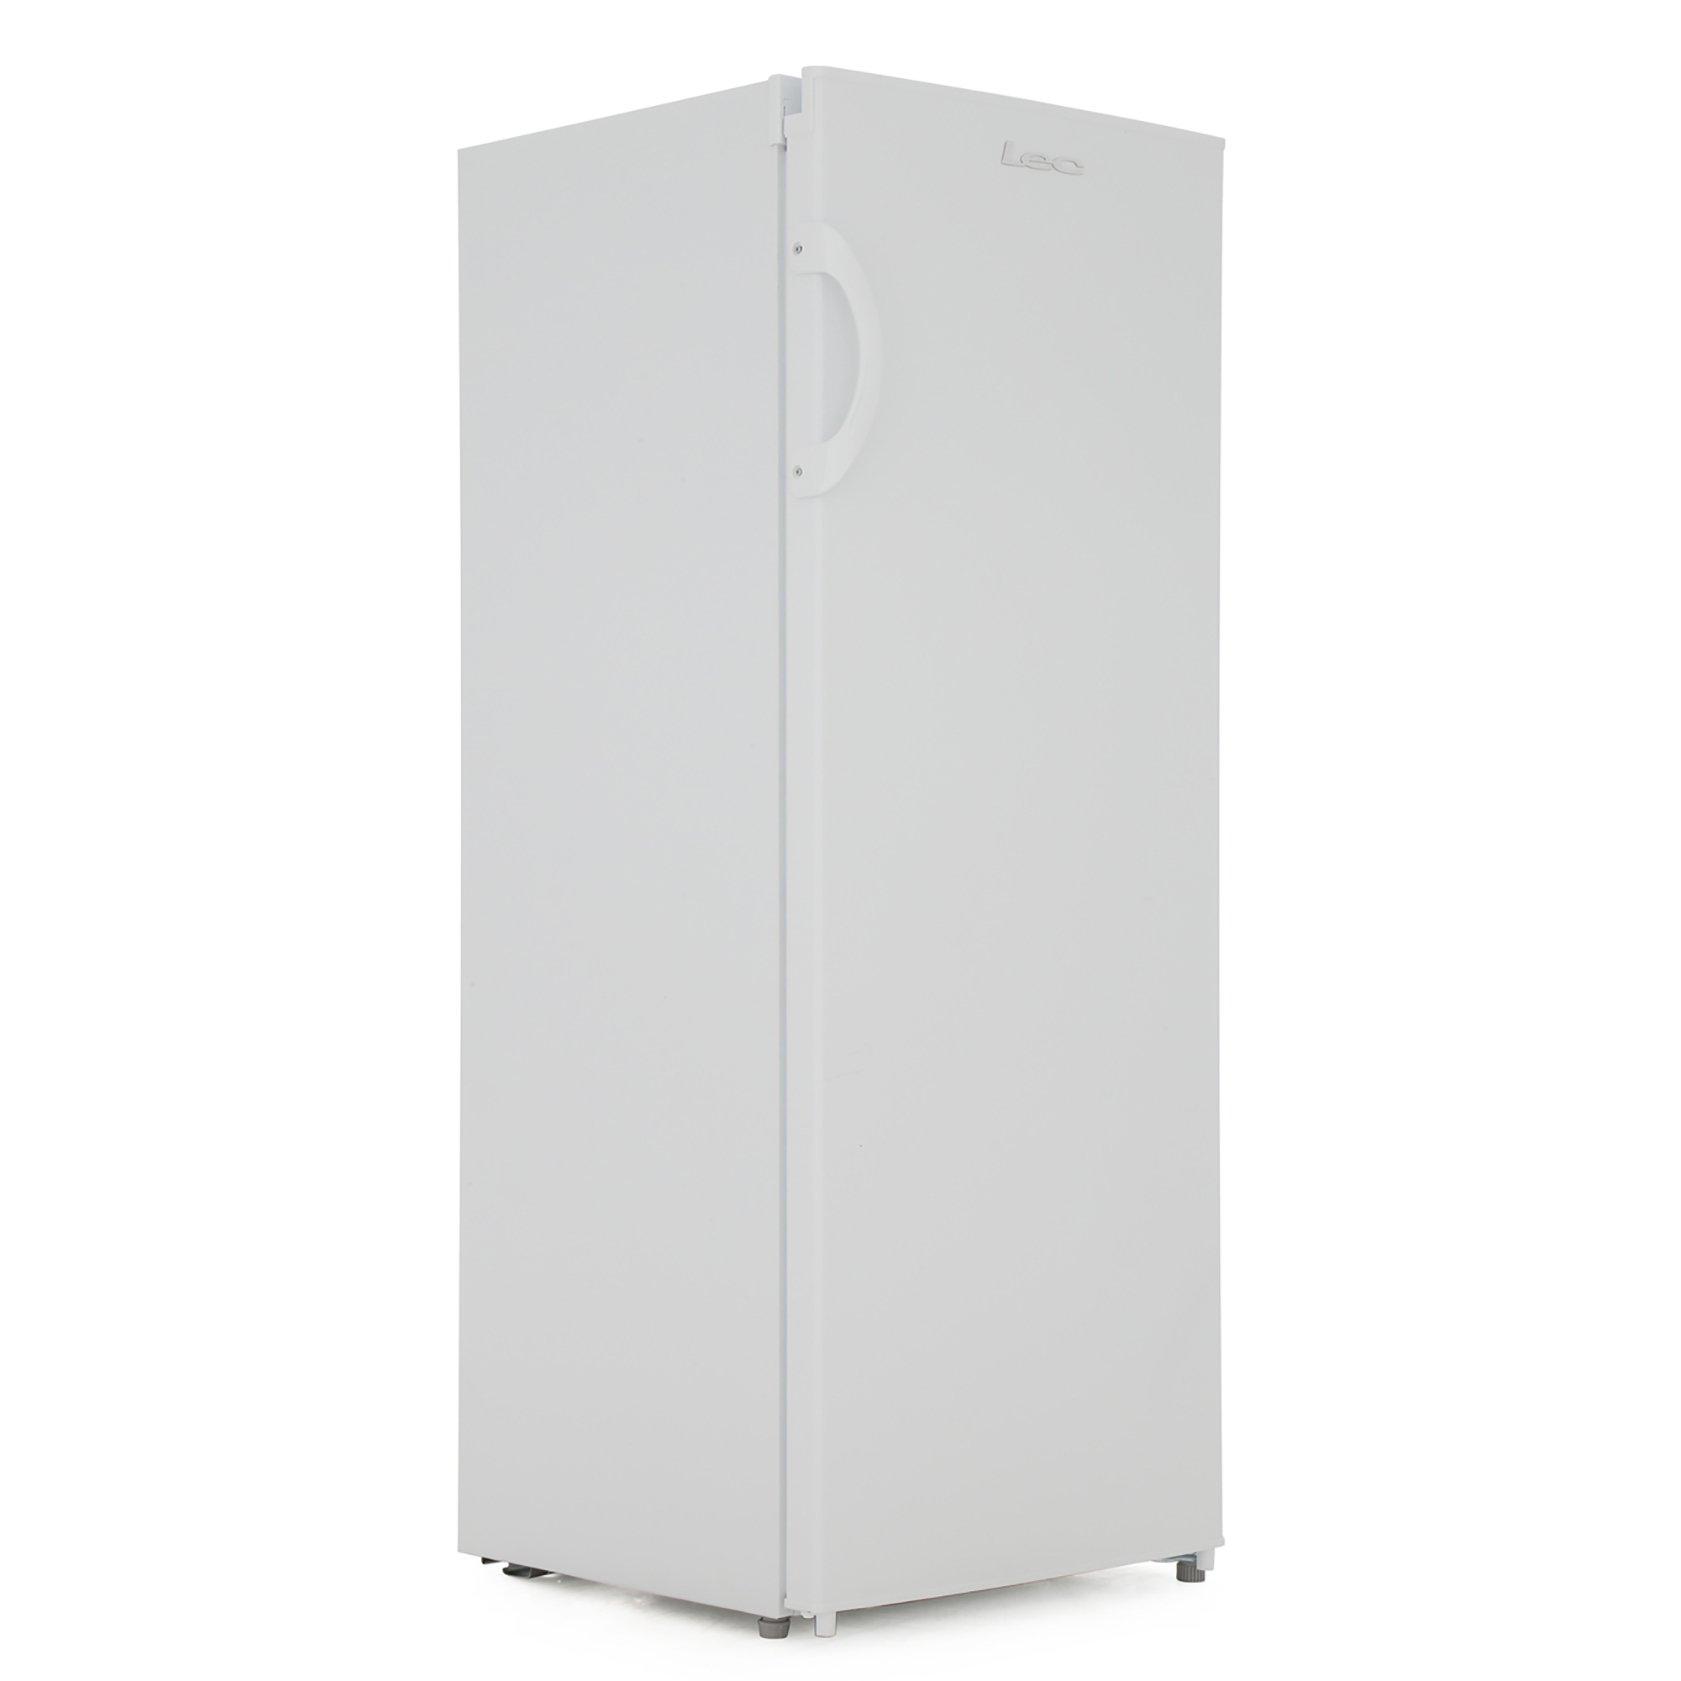 Lec TL55144W White Tall Larder Fridge